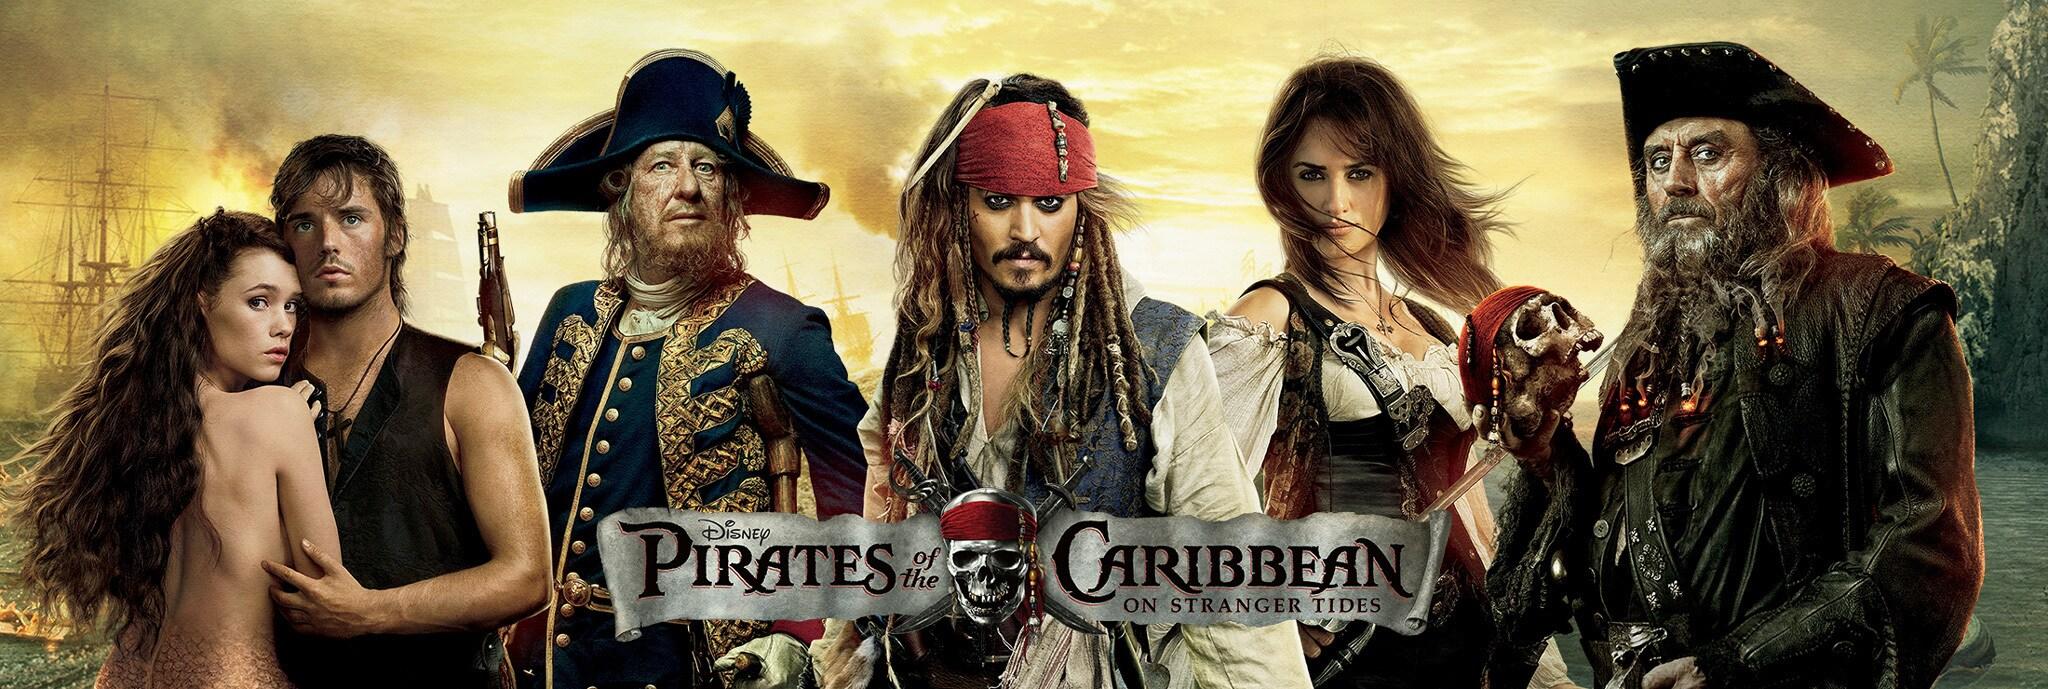 On Stranger Tides Pirates Of The Caribbean